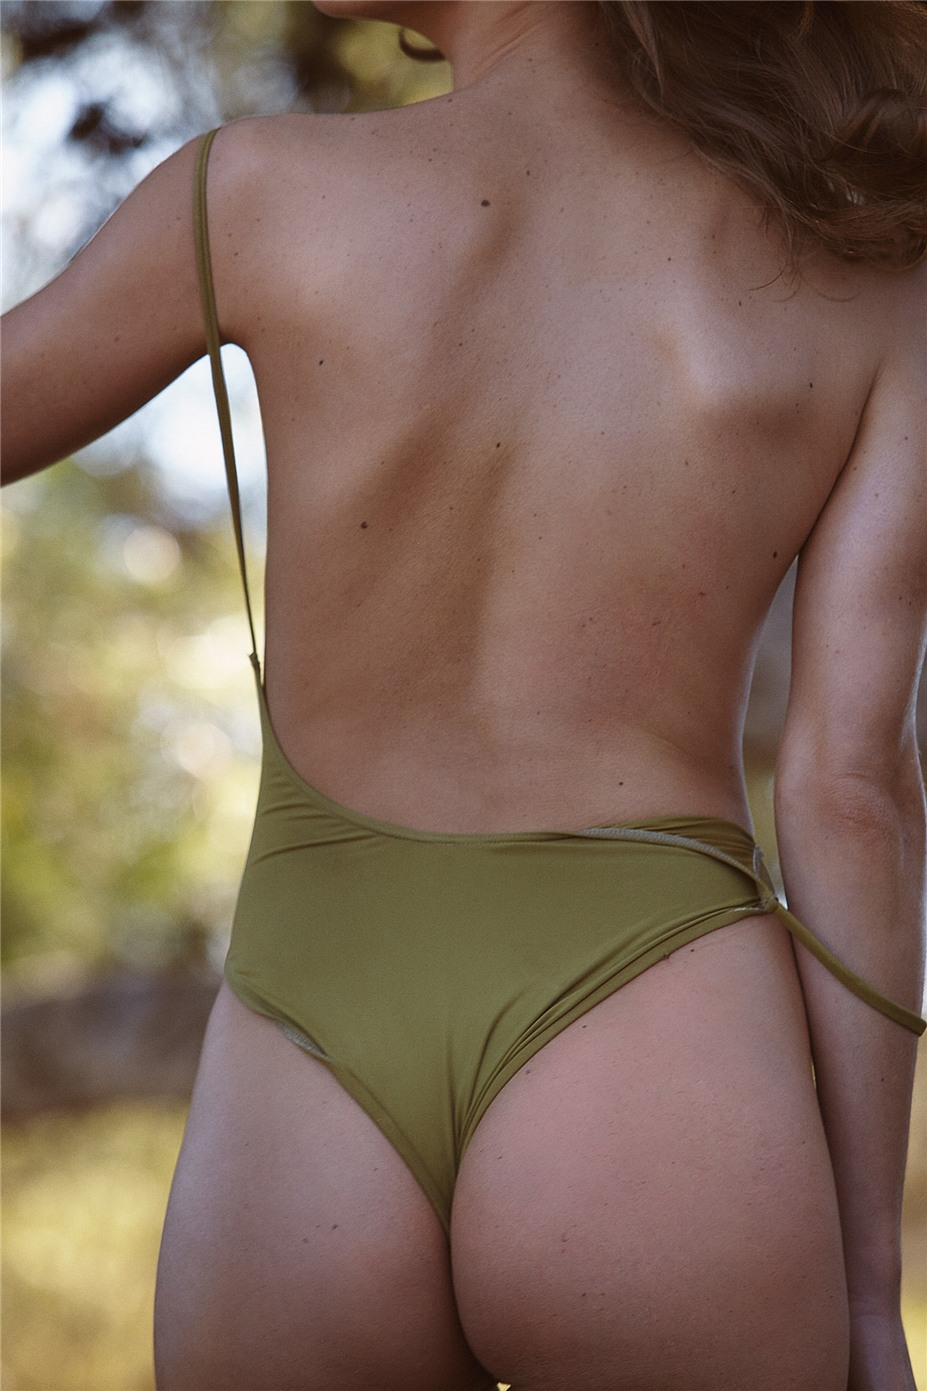 Обнаженные девушки на пляжах Ибицы / Ibiza Nudes by Diane Betties - Manouk Kroes